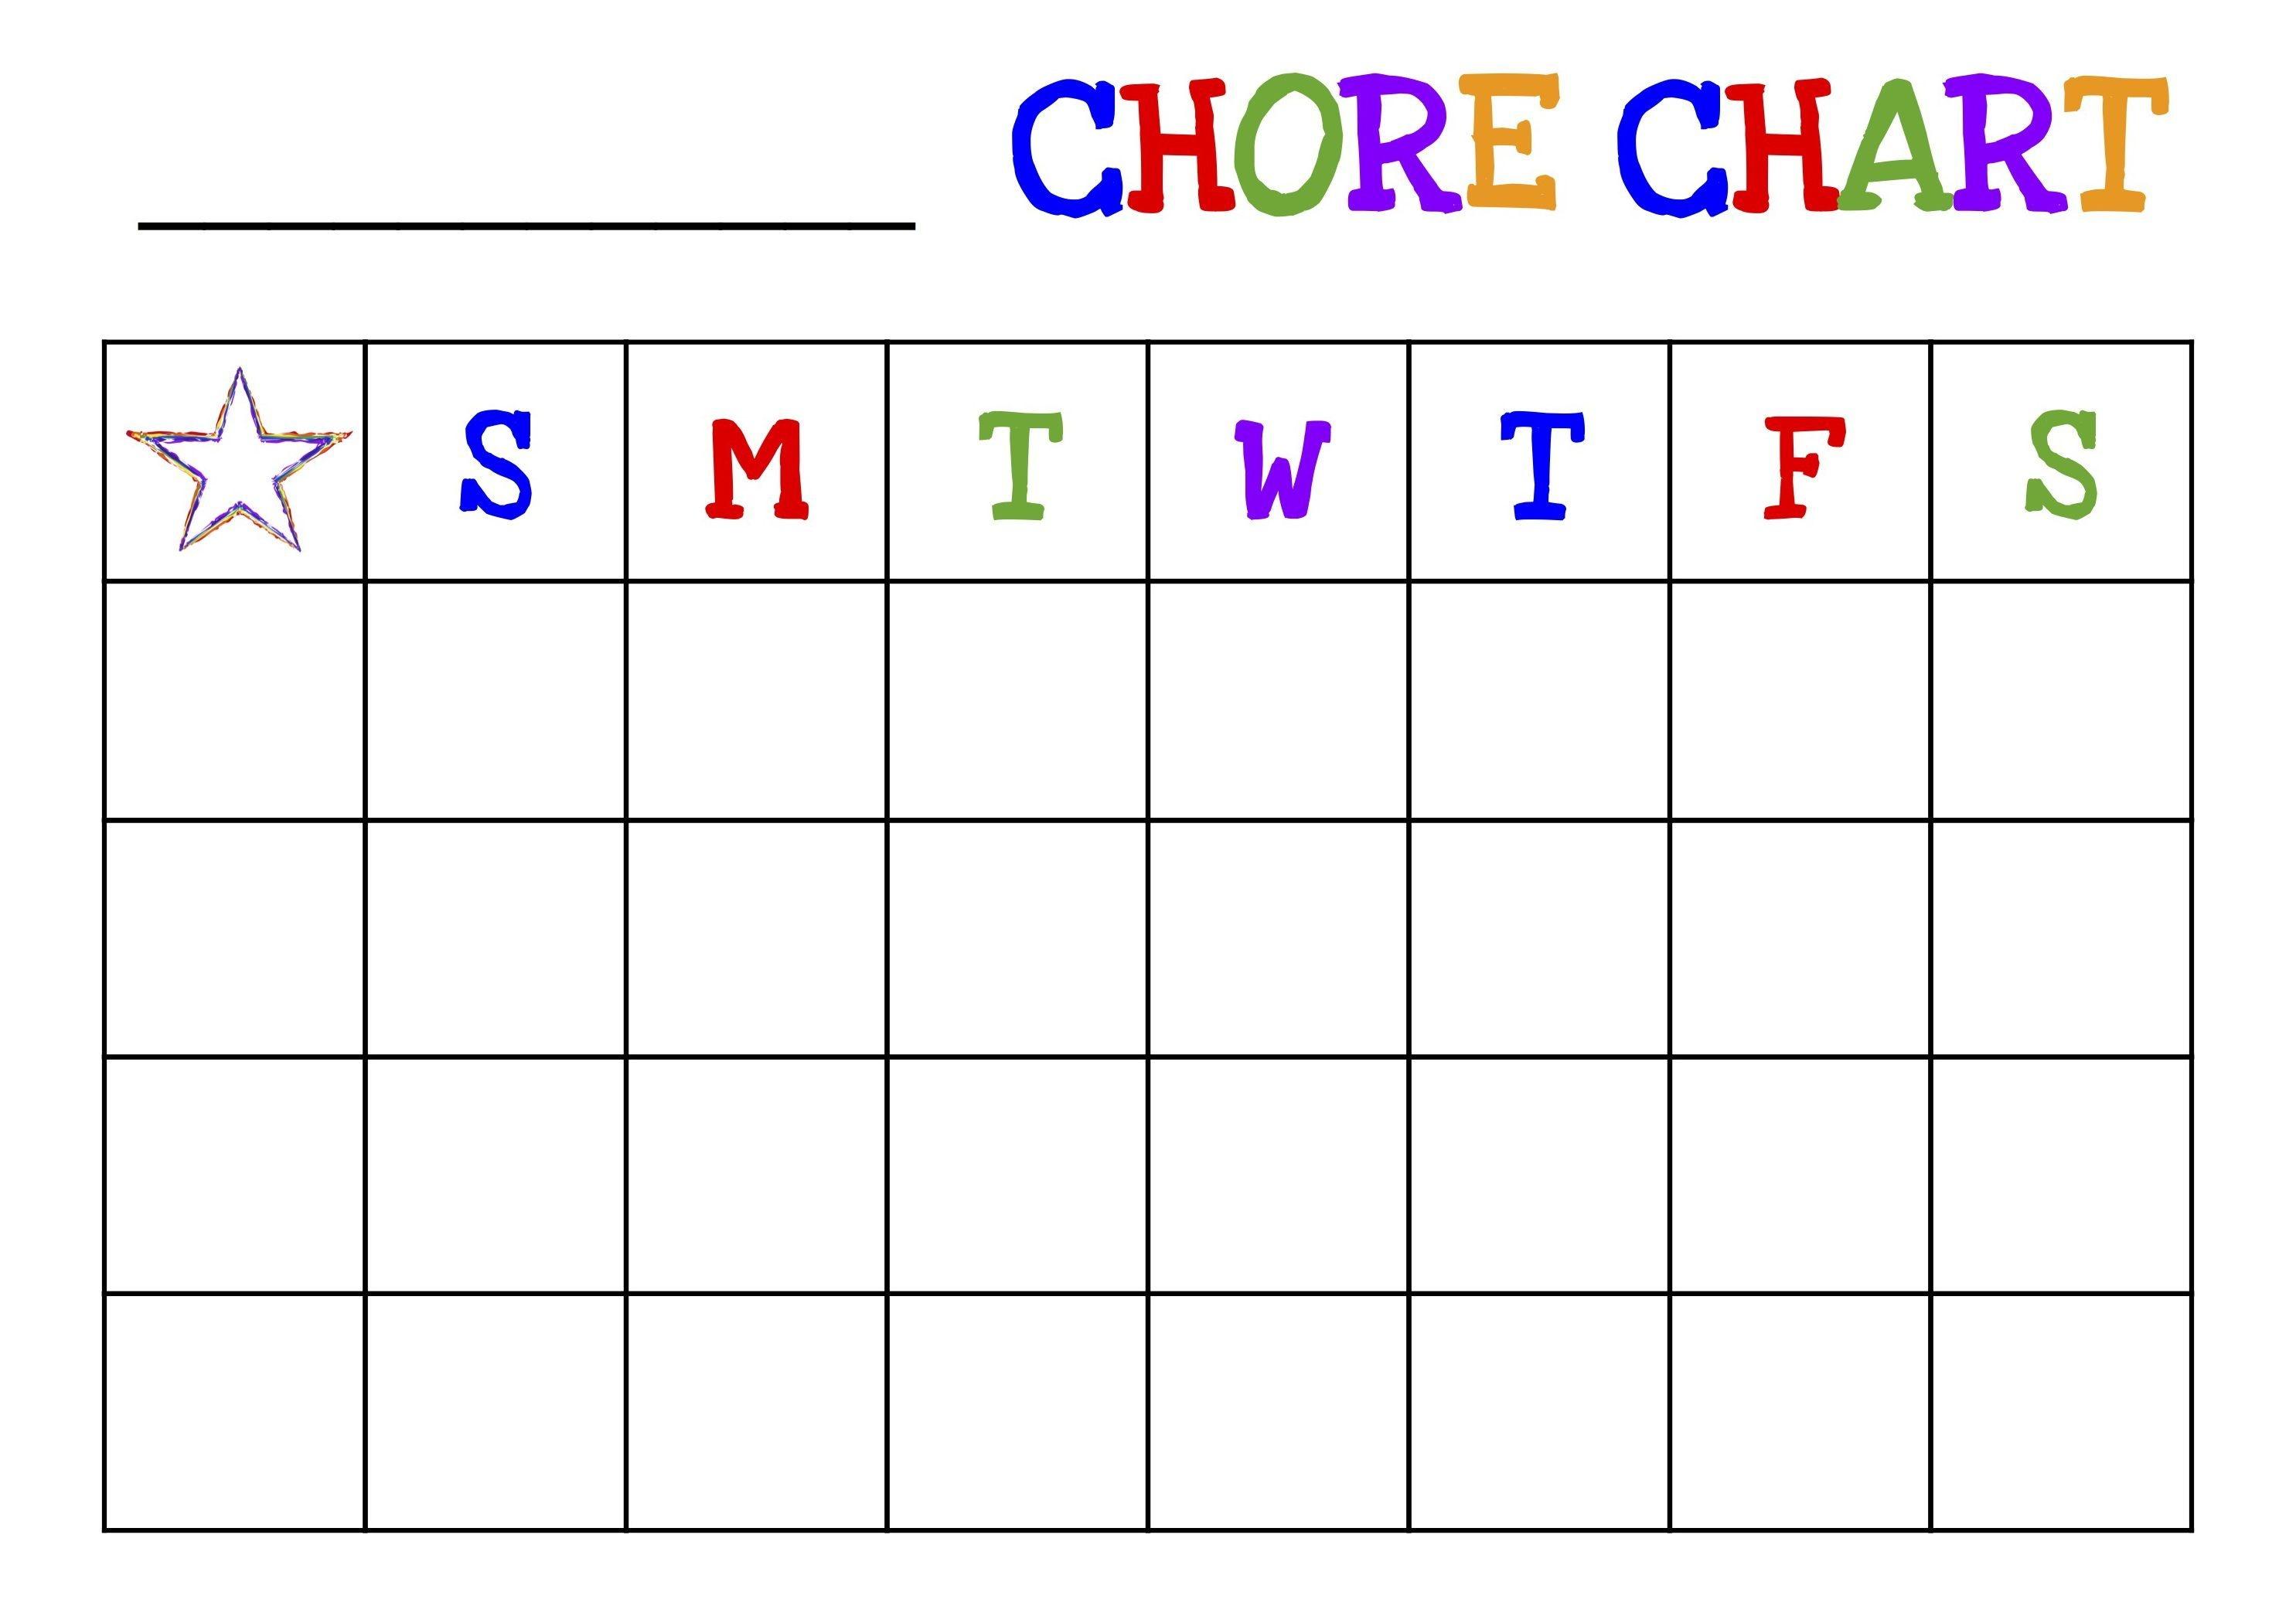 Printable Chore Charts Free | Acme Of Skill - Free Printable Job Charts For Preschoolers